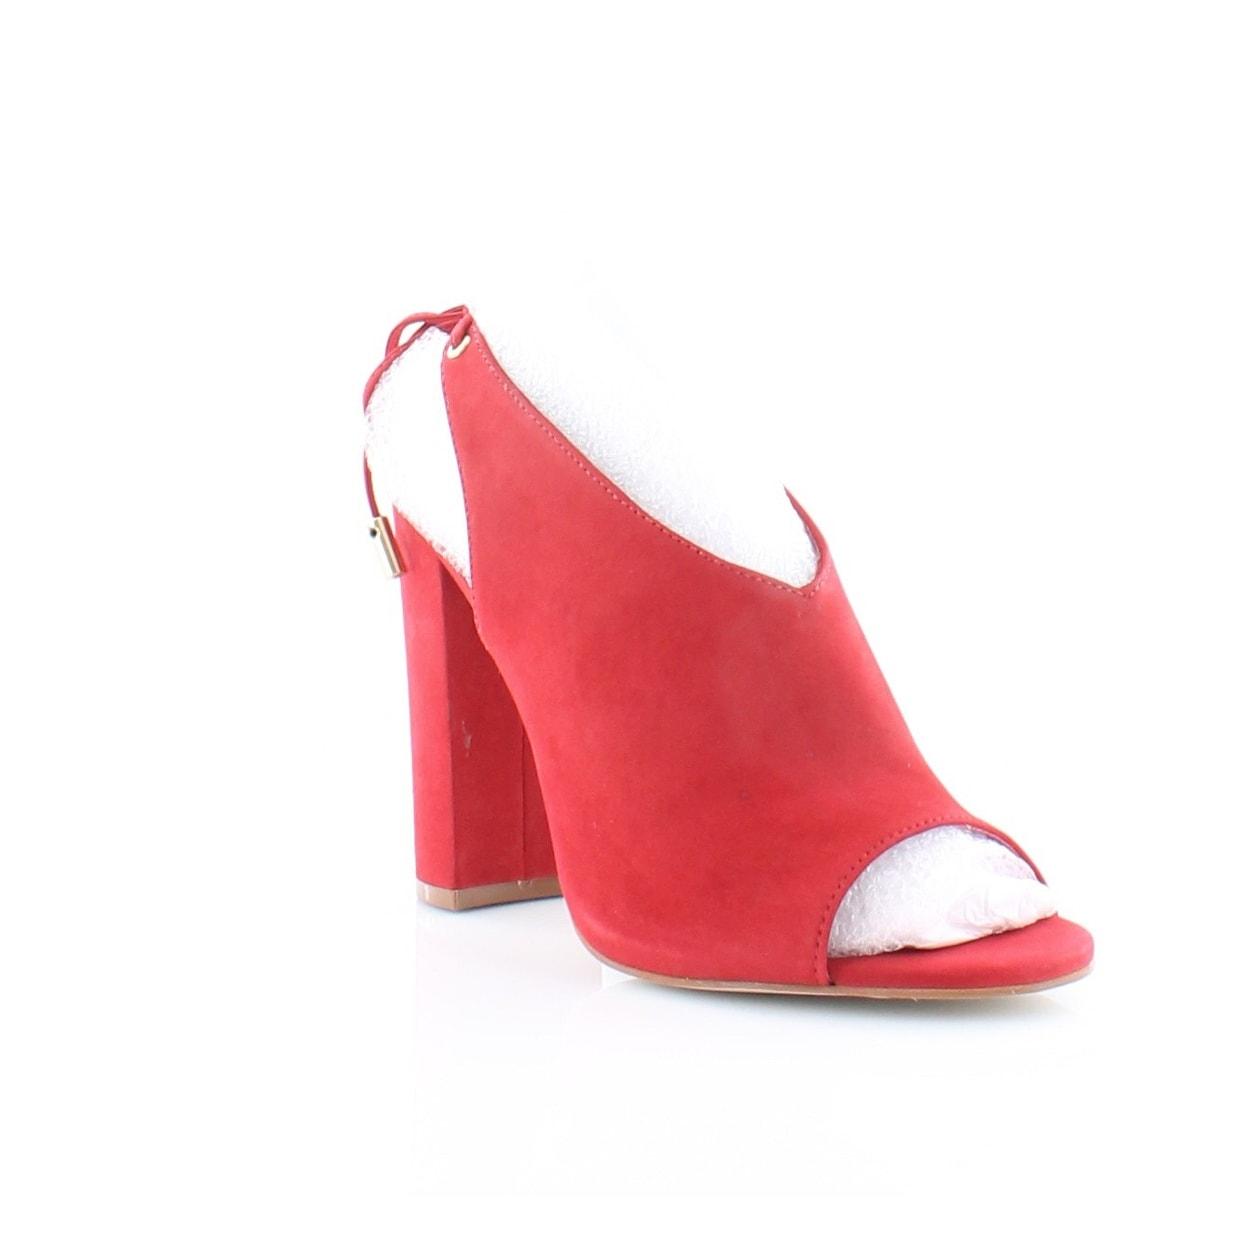 c695a33b2dc Red Steve Madden Women s Shoes